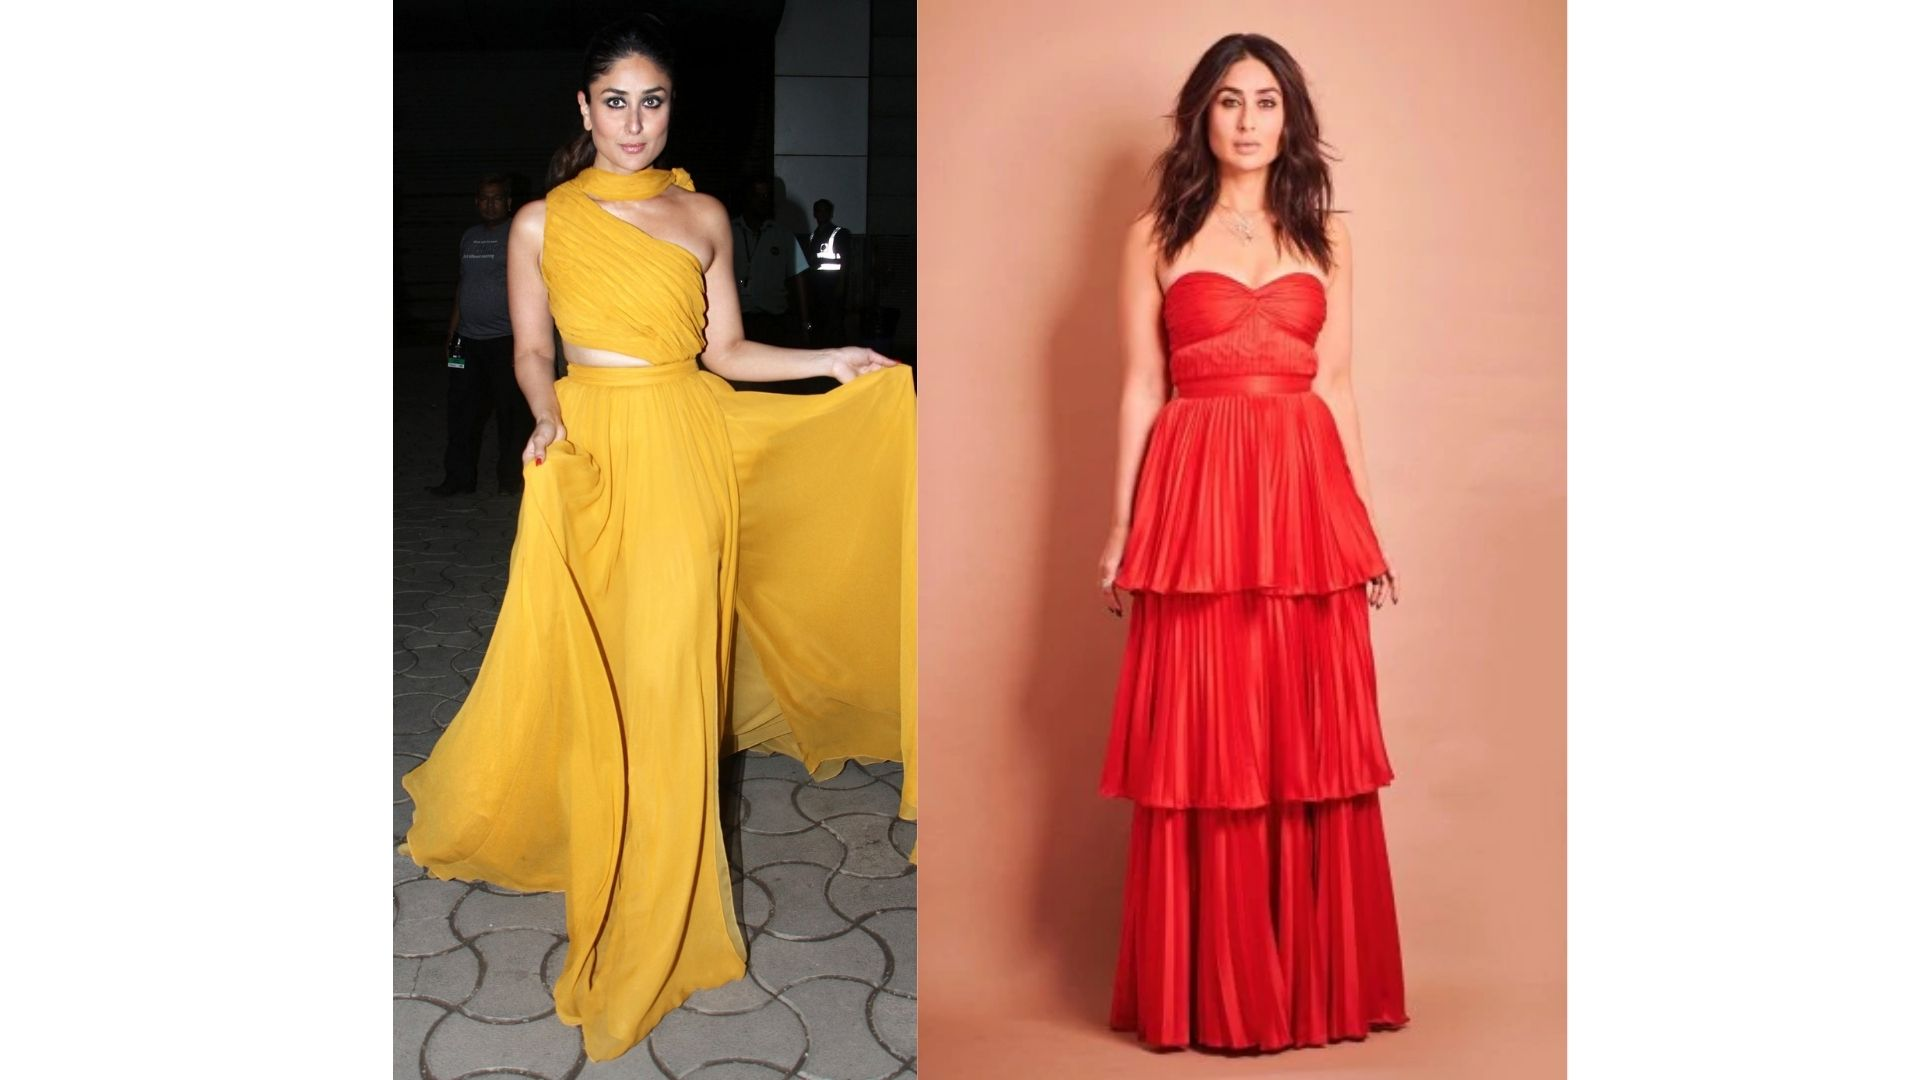 Kareena Kapoor's Most Fashionable Moments That Prove She's The Ultimate Fashionista